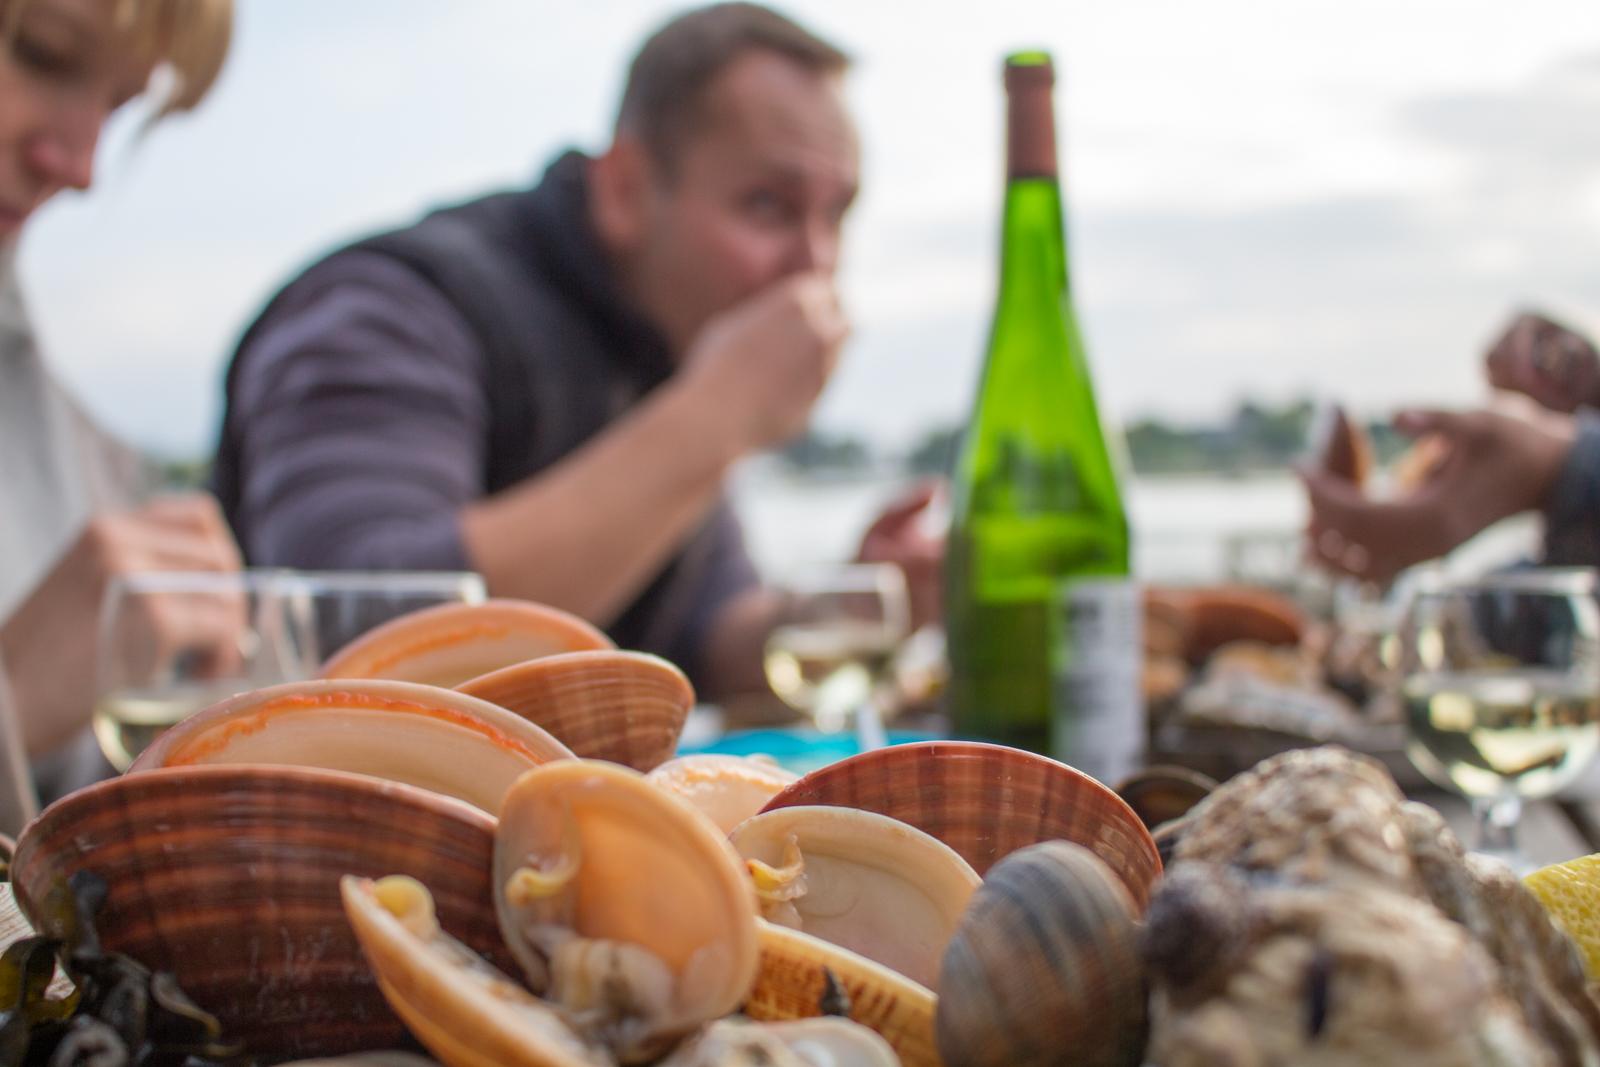 Austernzucht, Bretagne, Muscheln, Kulinarik